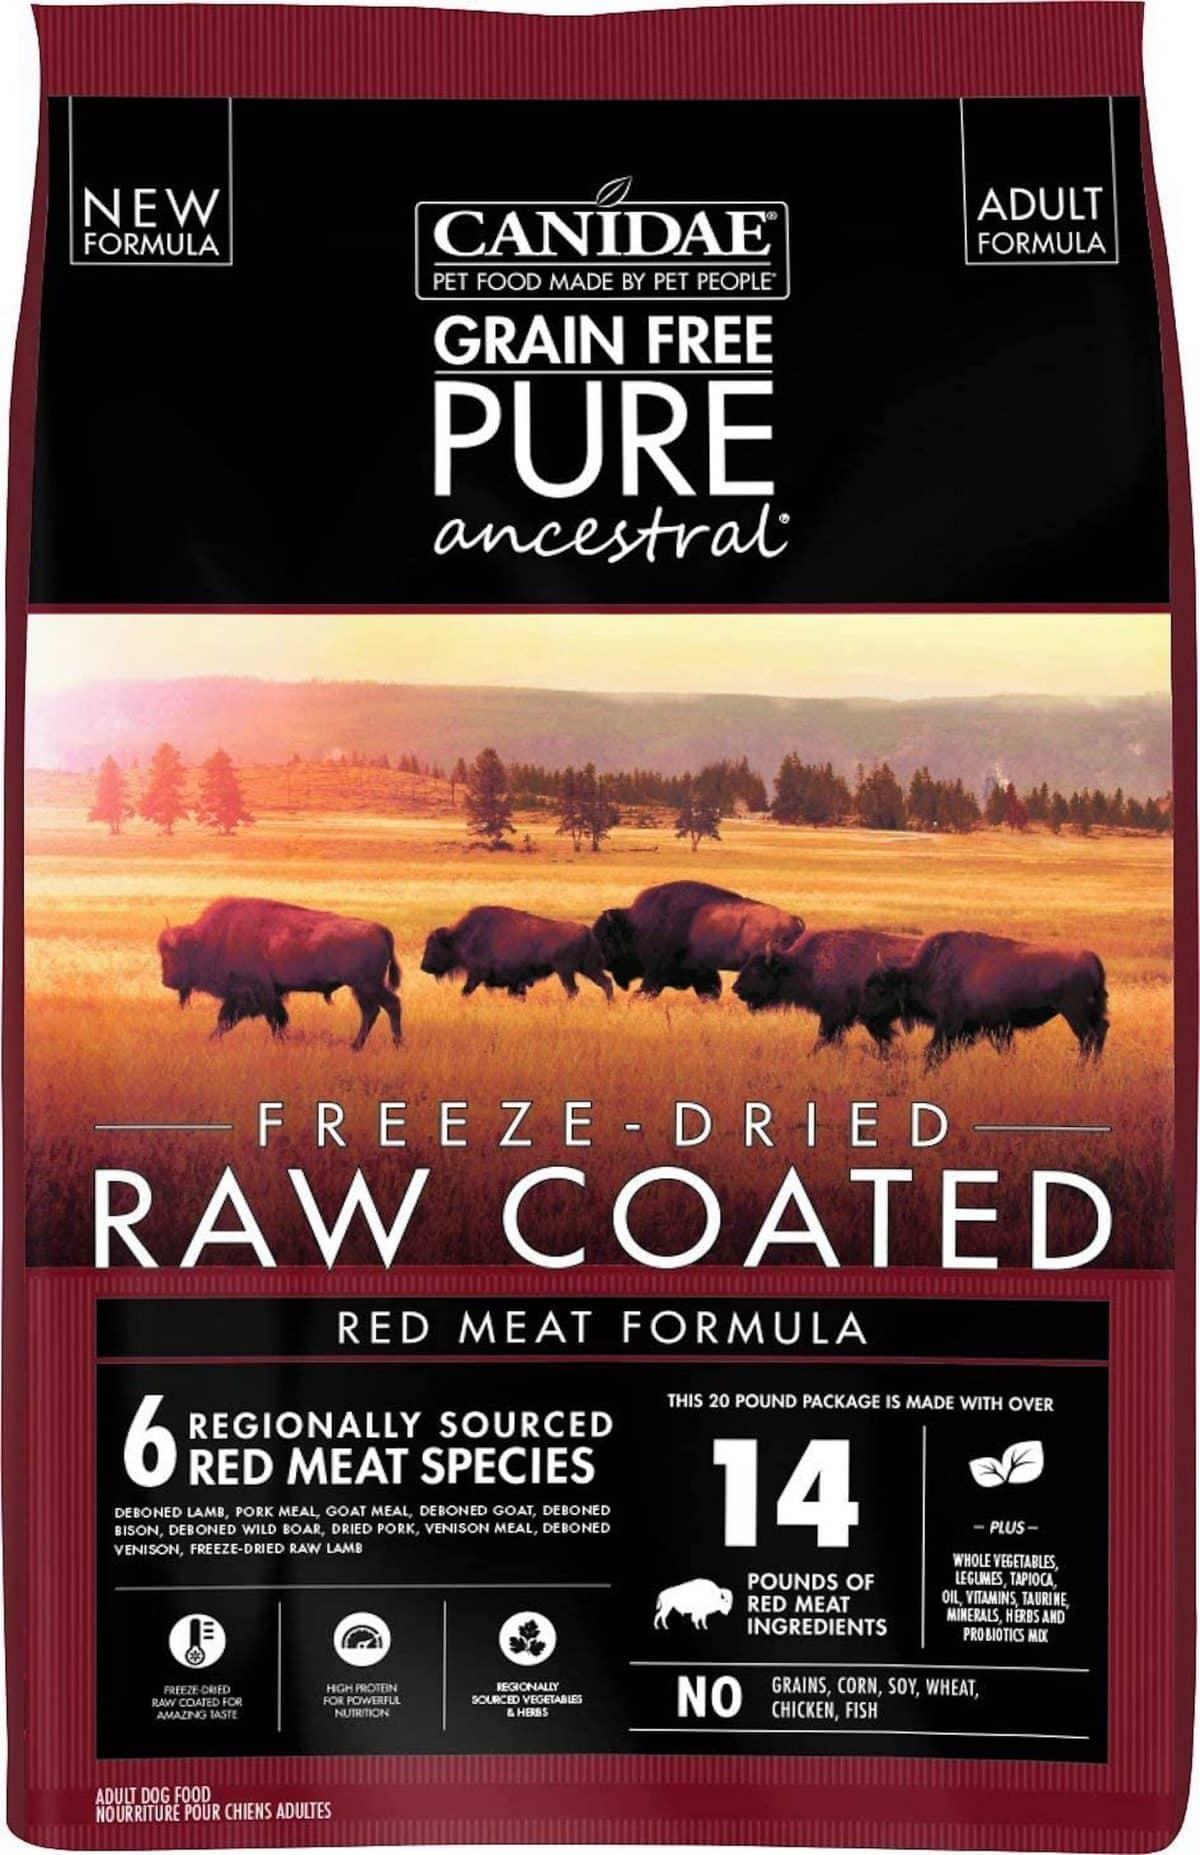 Canidae Grain-Free Pure Ancestral